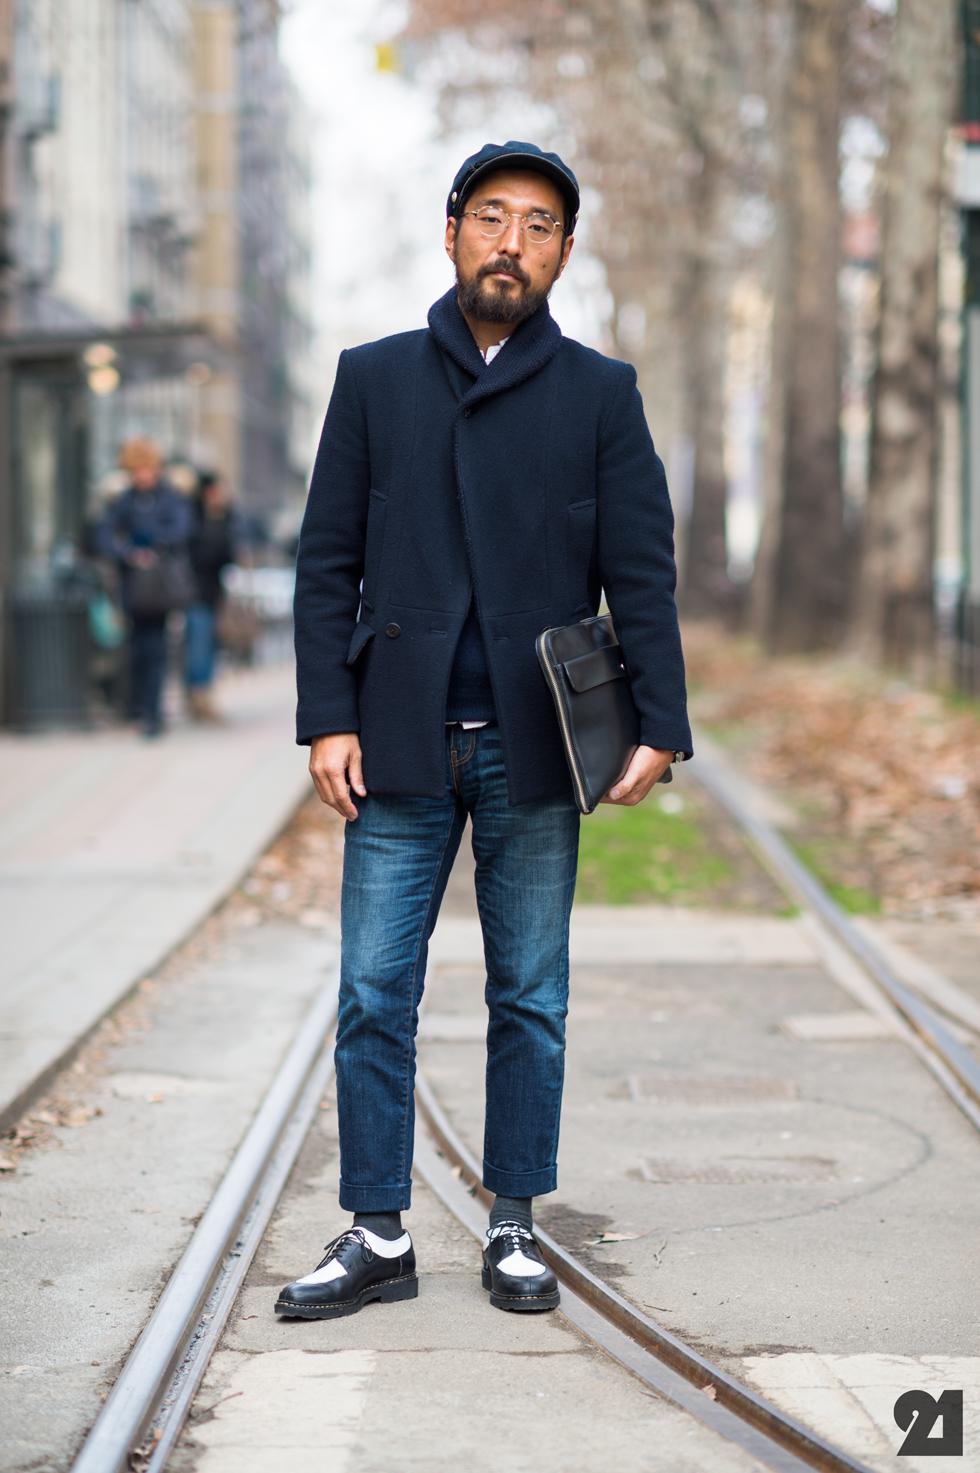 fashion-street-2014-men.jpg